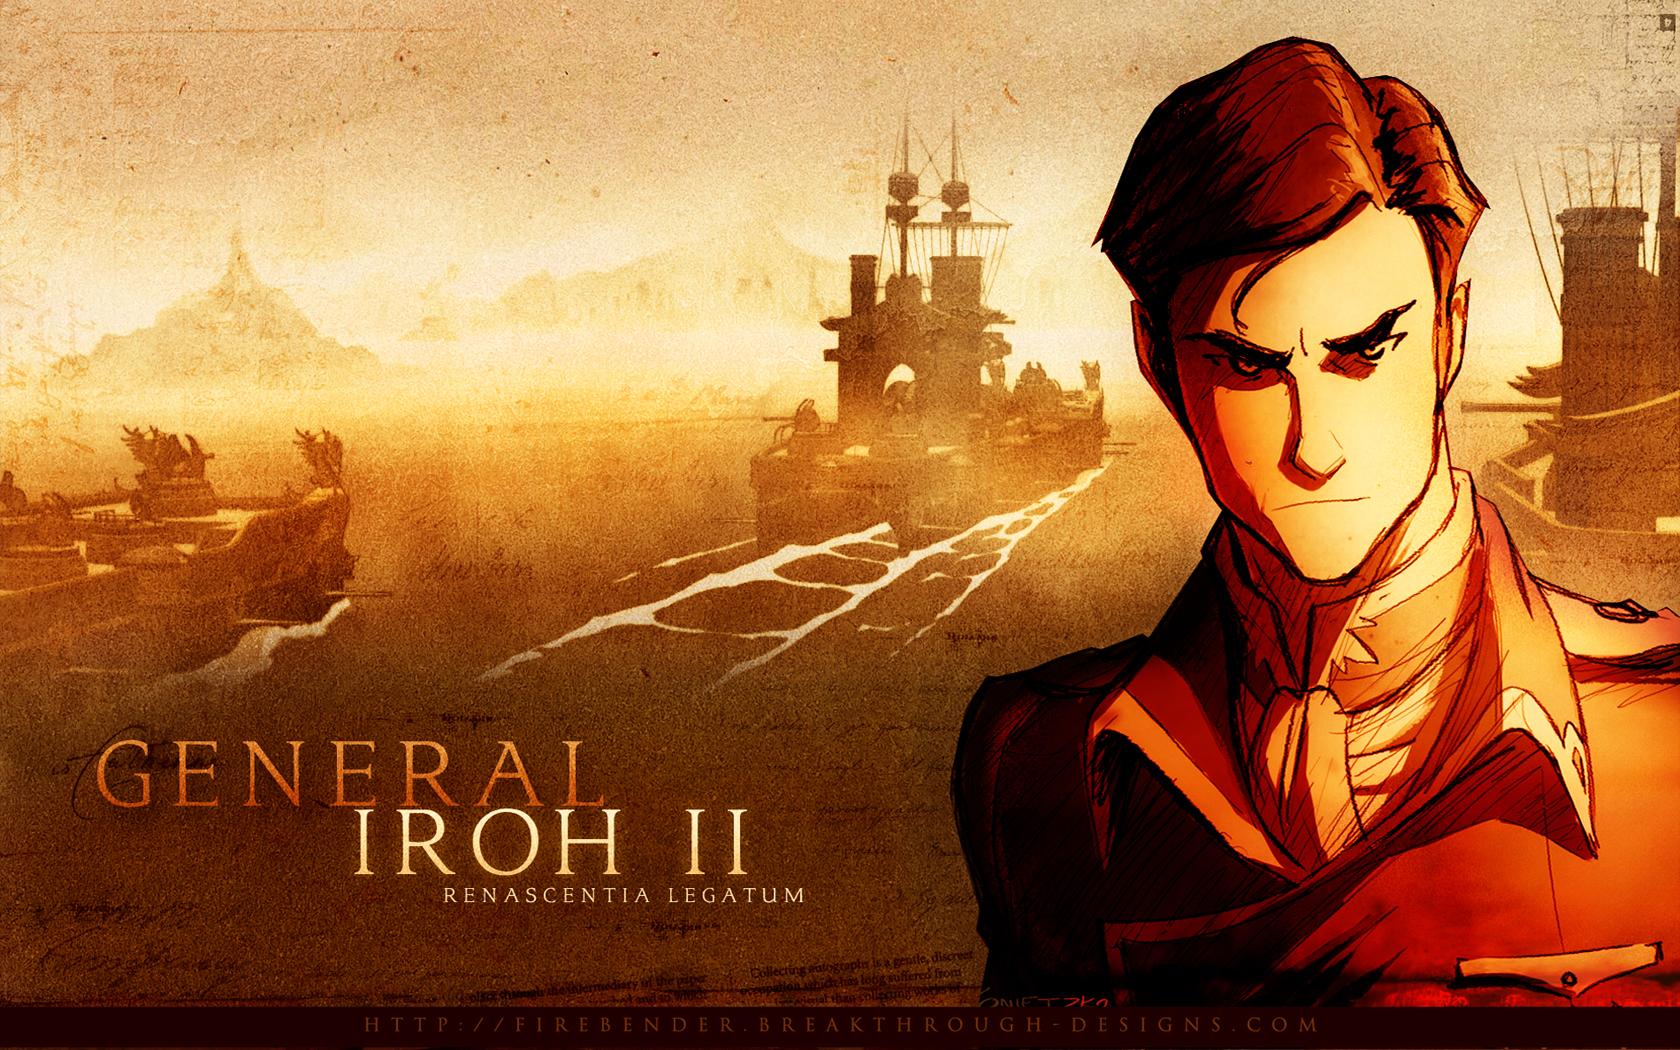 General Iroh II by BreakthroughDesigns